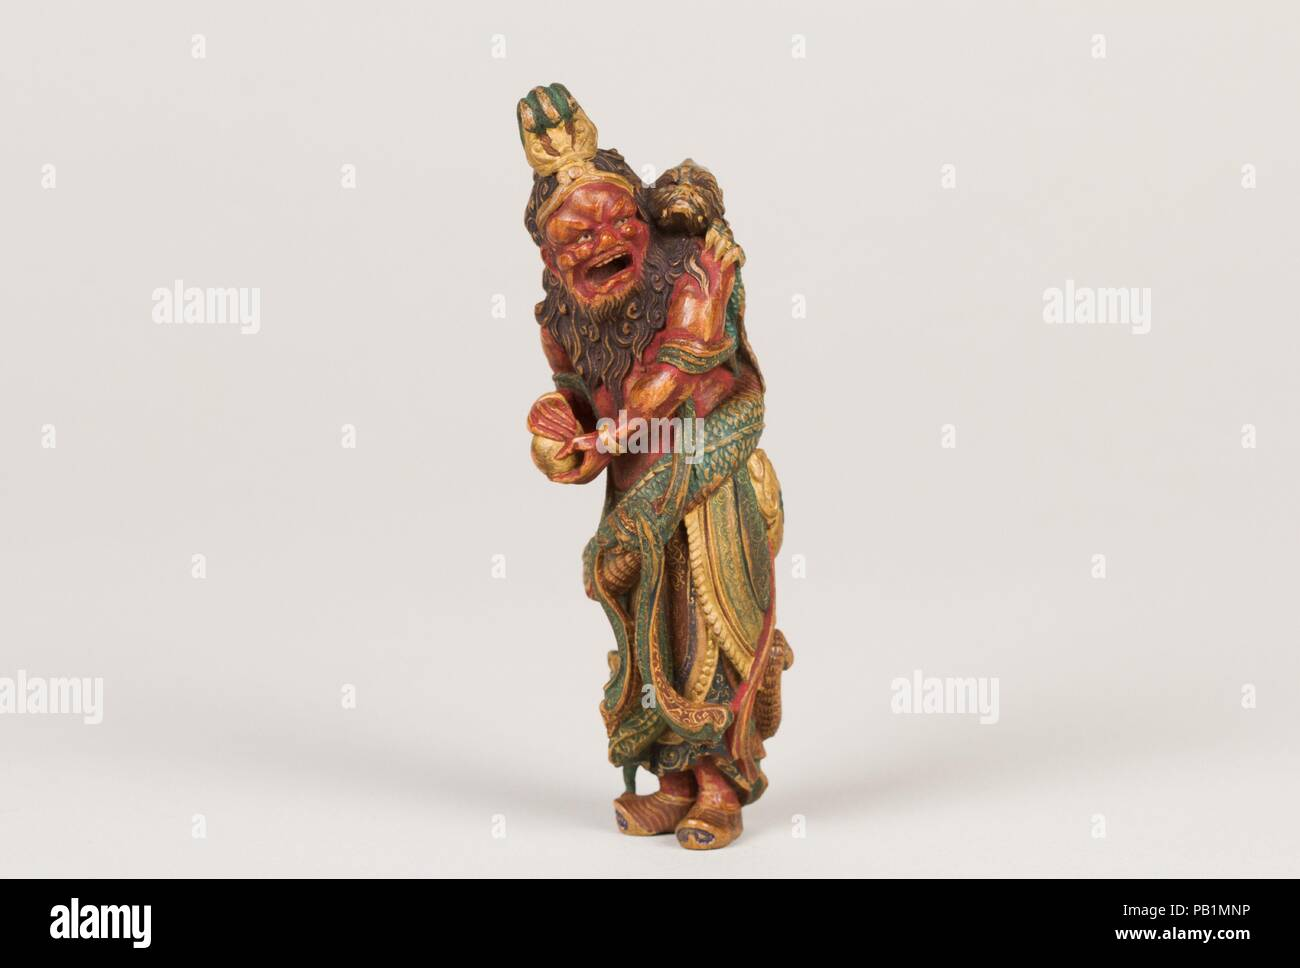 Ryujin Dragon King Of The Sea Culture Japan Dimensions